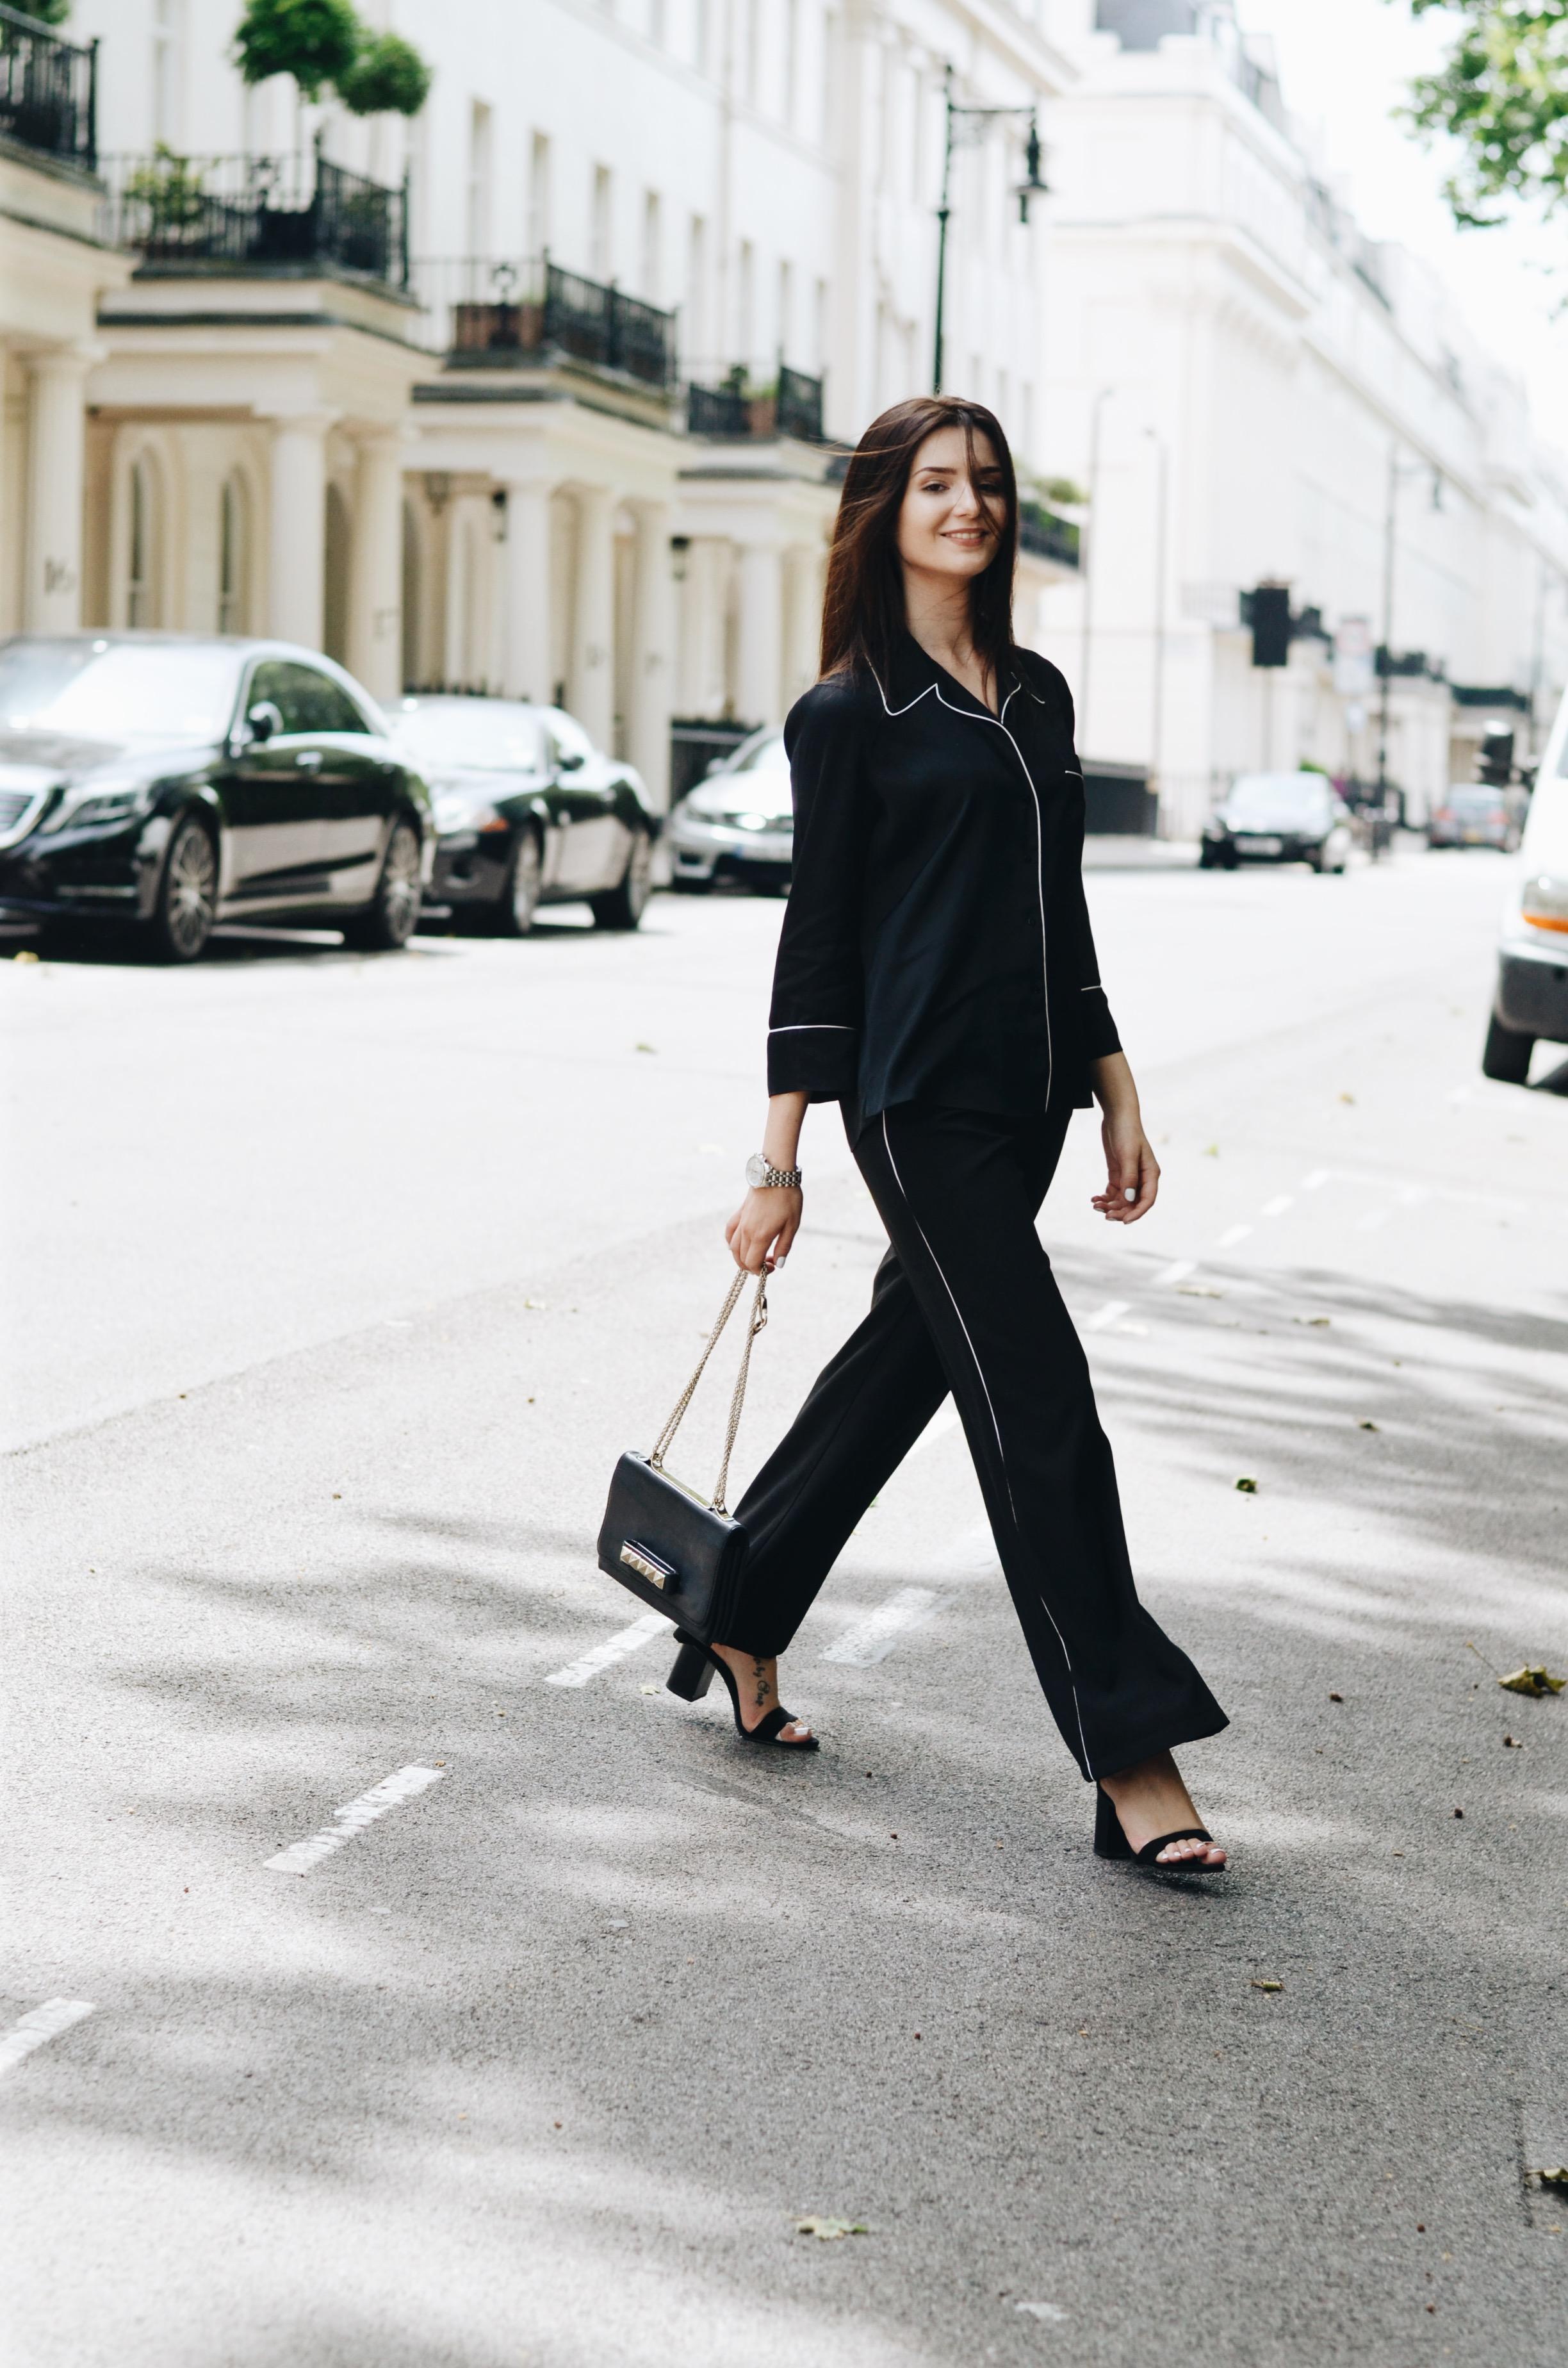 Shirt: Zara Studio | Pants: Dorothy Perkins* | Heels: Zara | Watch: Thomas Sabo* | Bag: Valentino